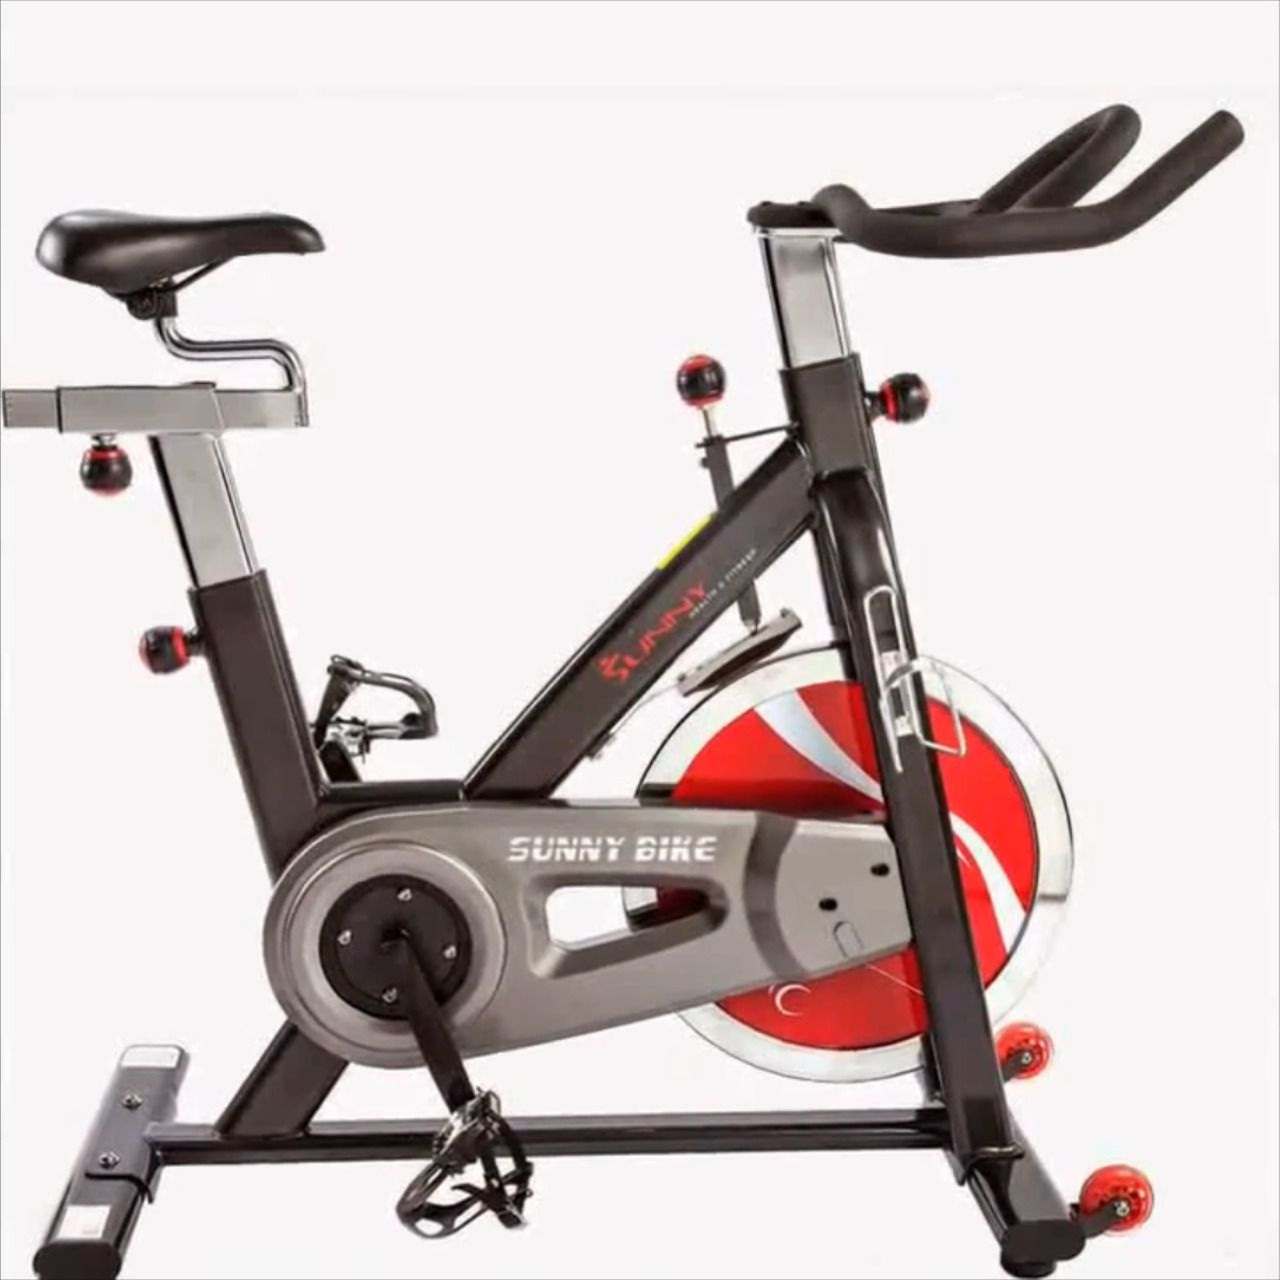 Elliptical Vs Stationary Bike Exercise Bike Target Kmart Exercise Bike Schwinn 270 Recumbent Bike R Indoor Cycling Bike Best Exercise Bike Spin Bike Reviews